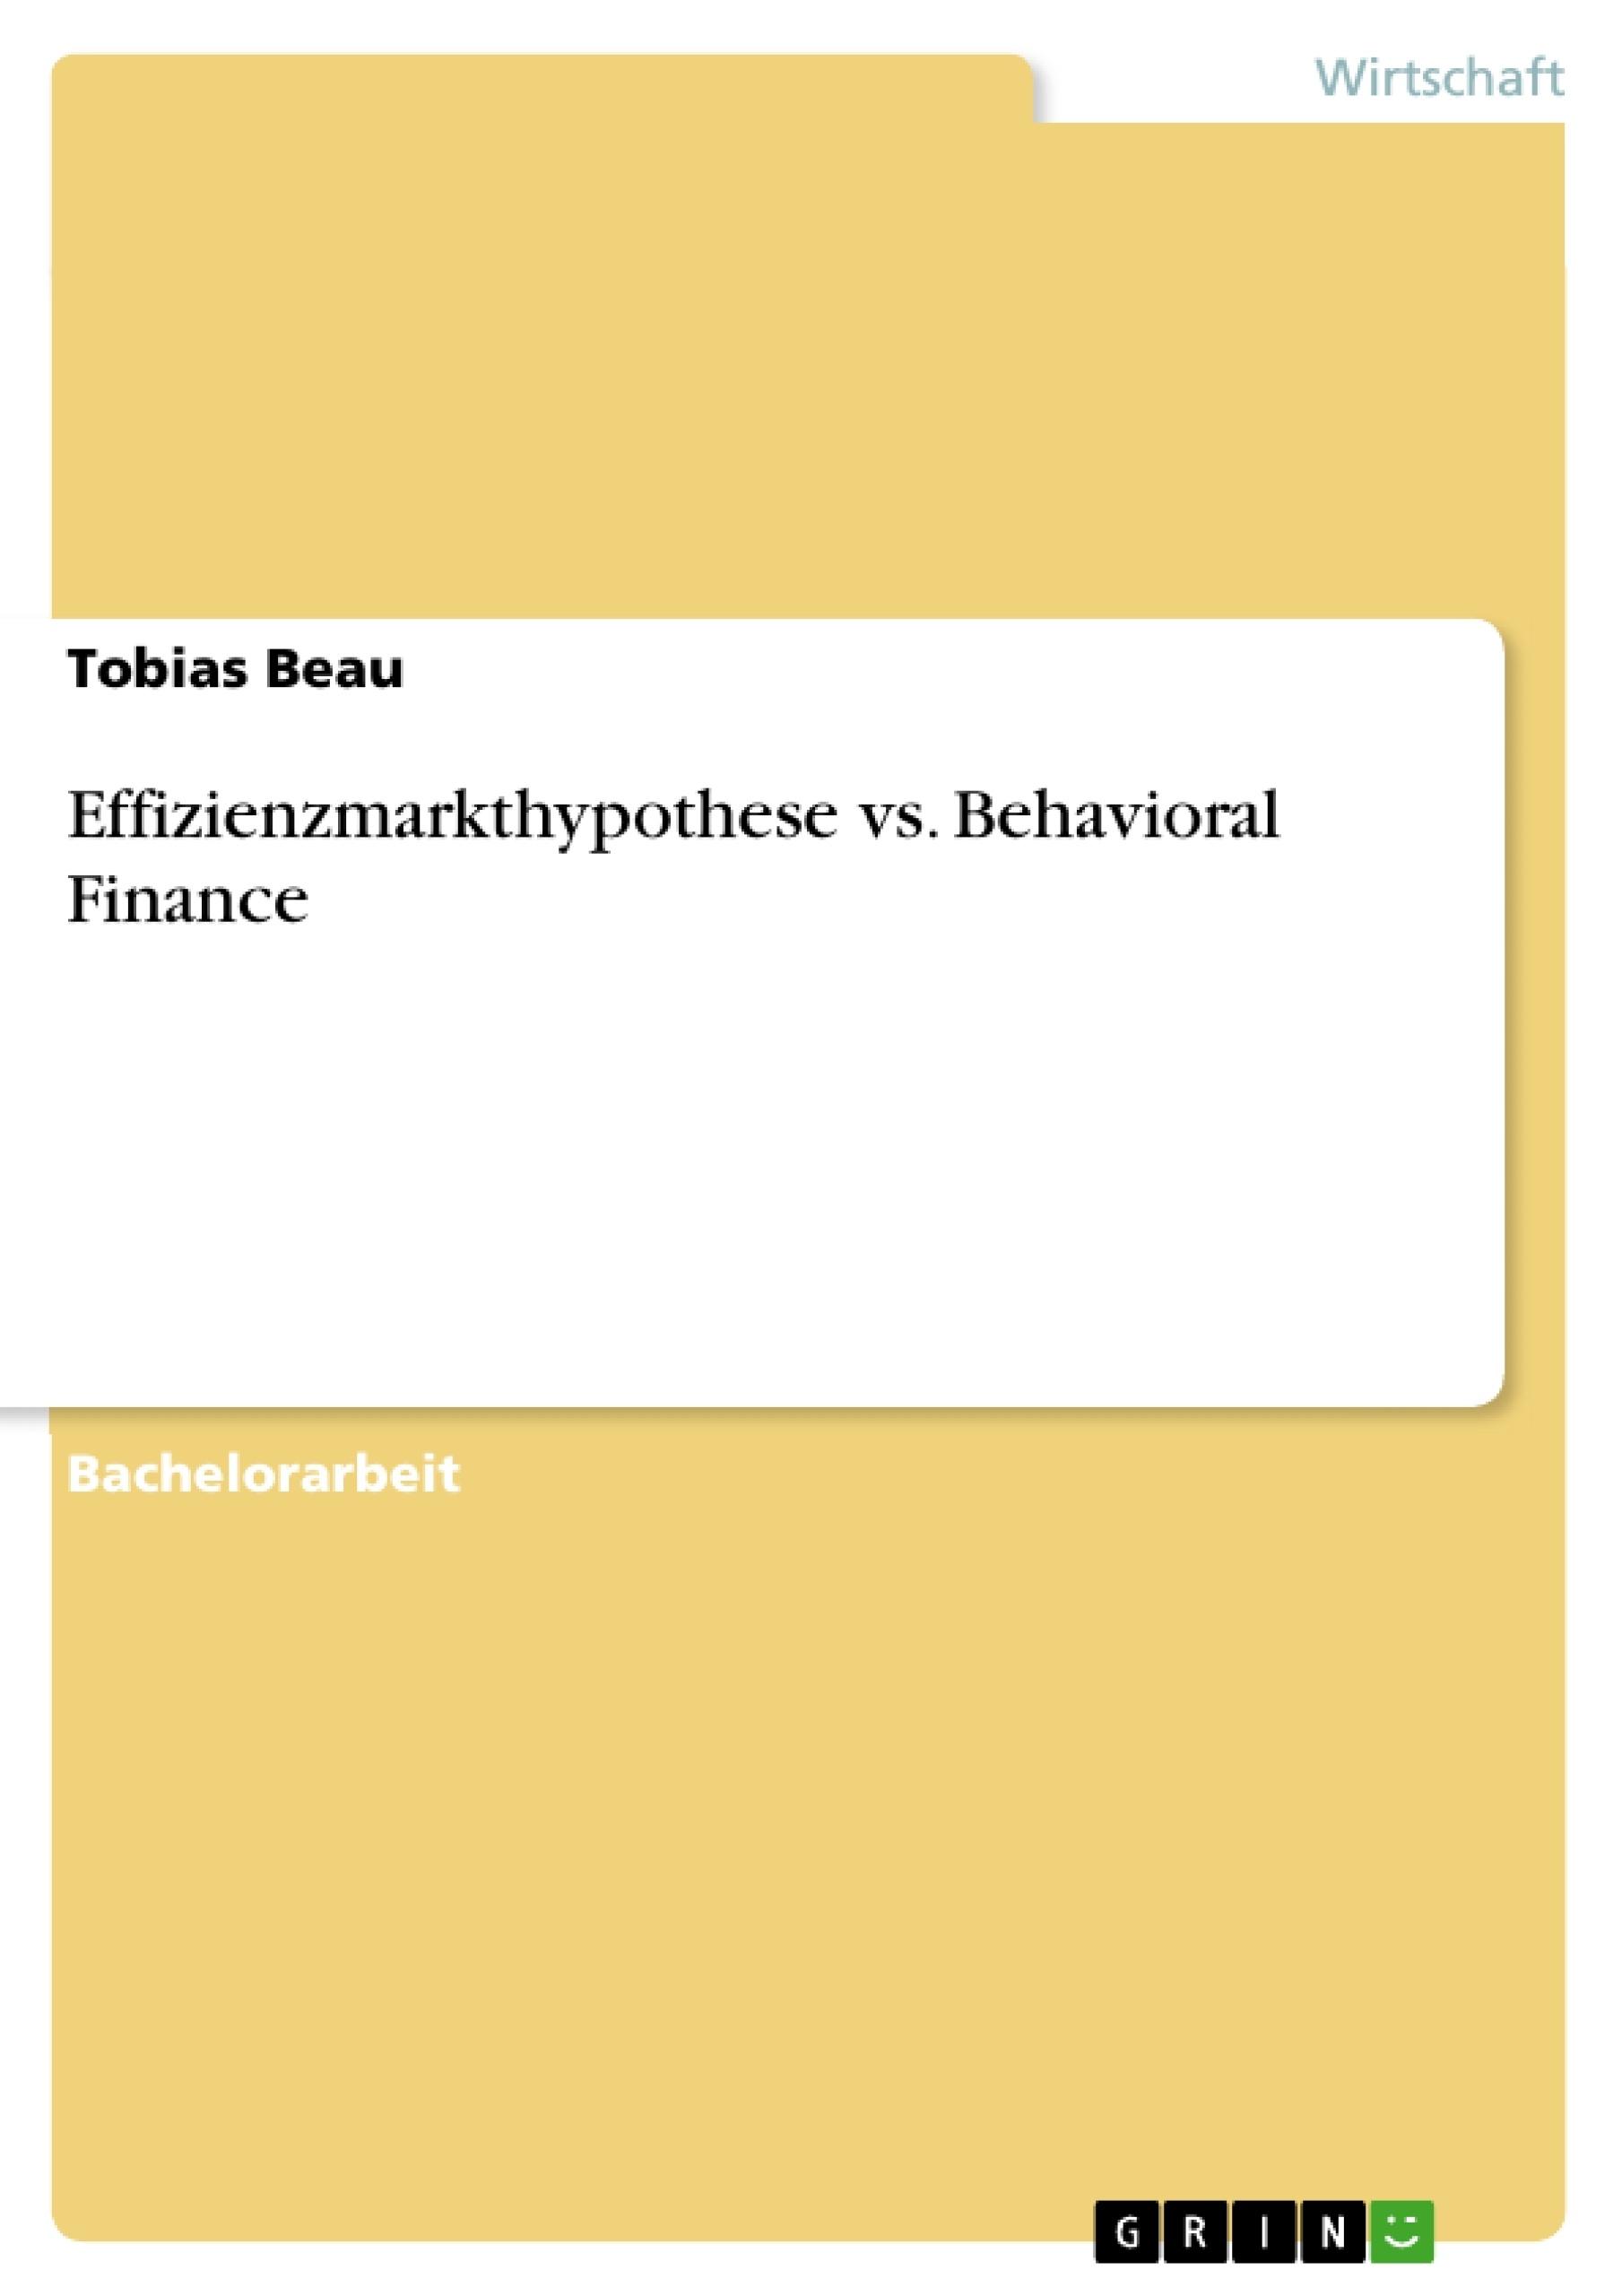 Titel: Effizienzmarkthypothese vs. Behavioral Finance